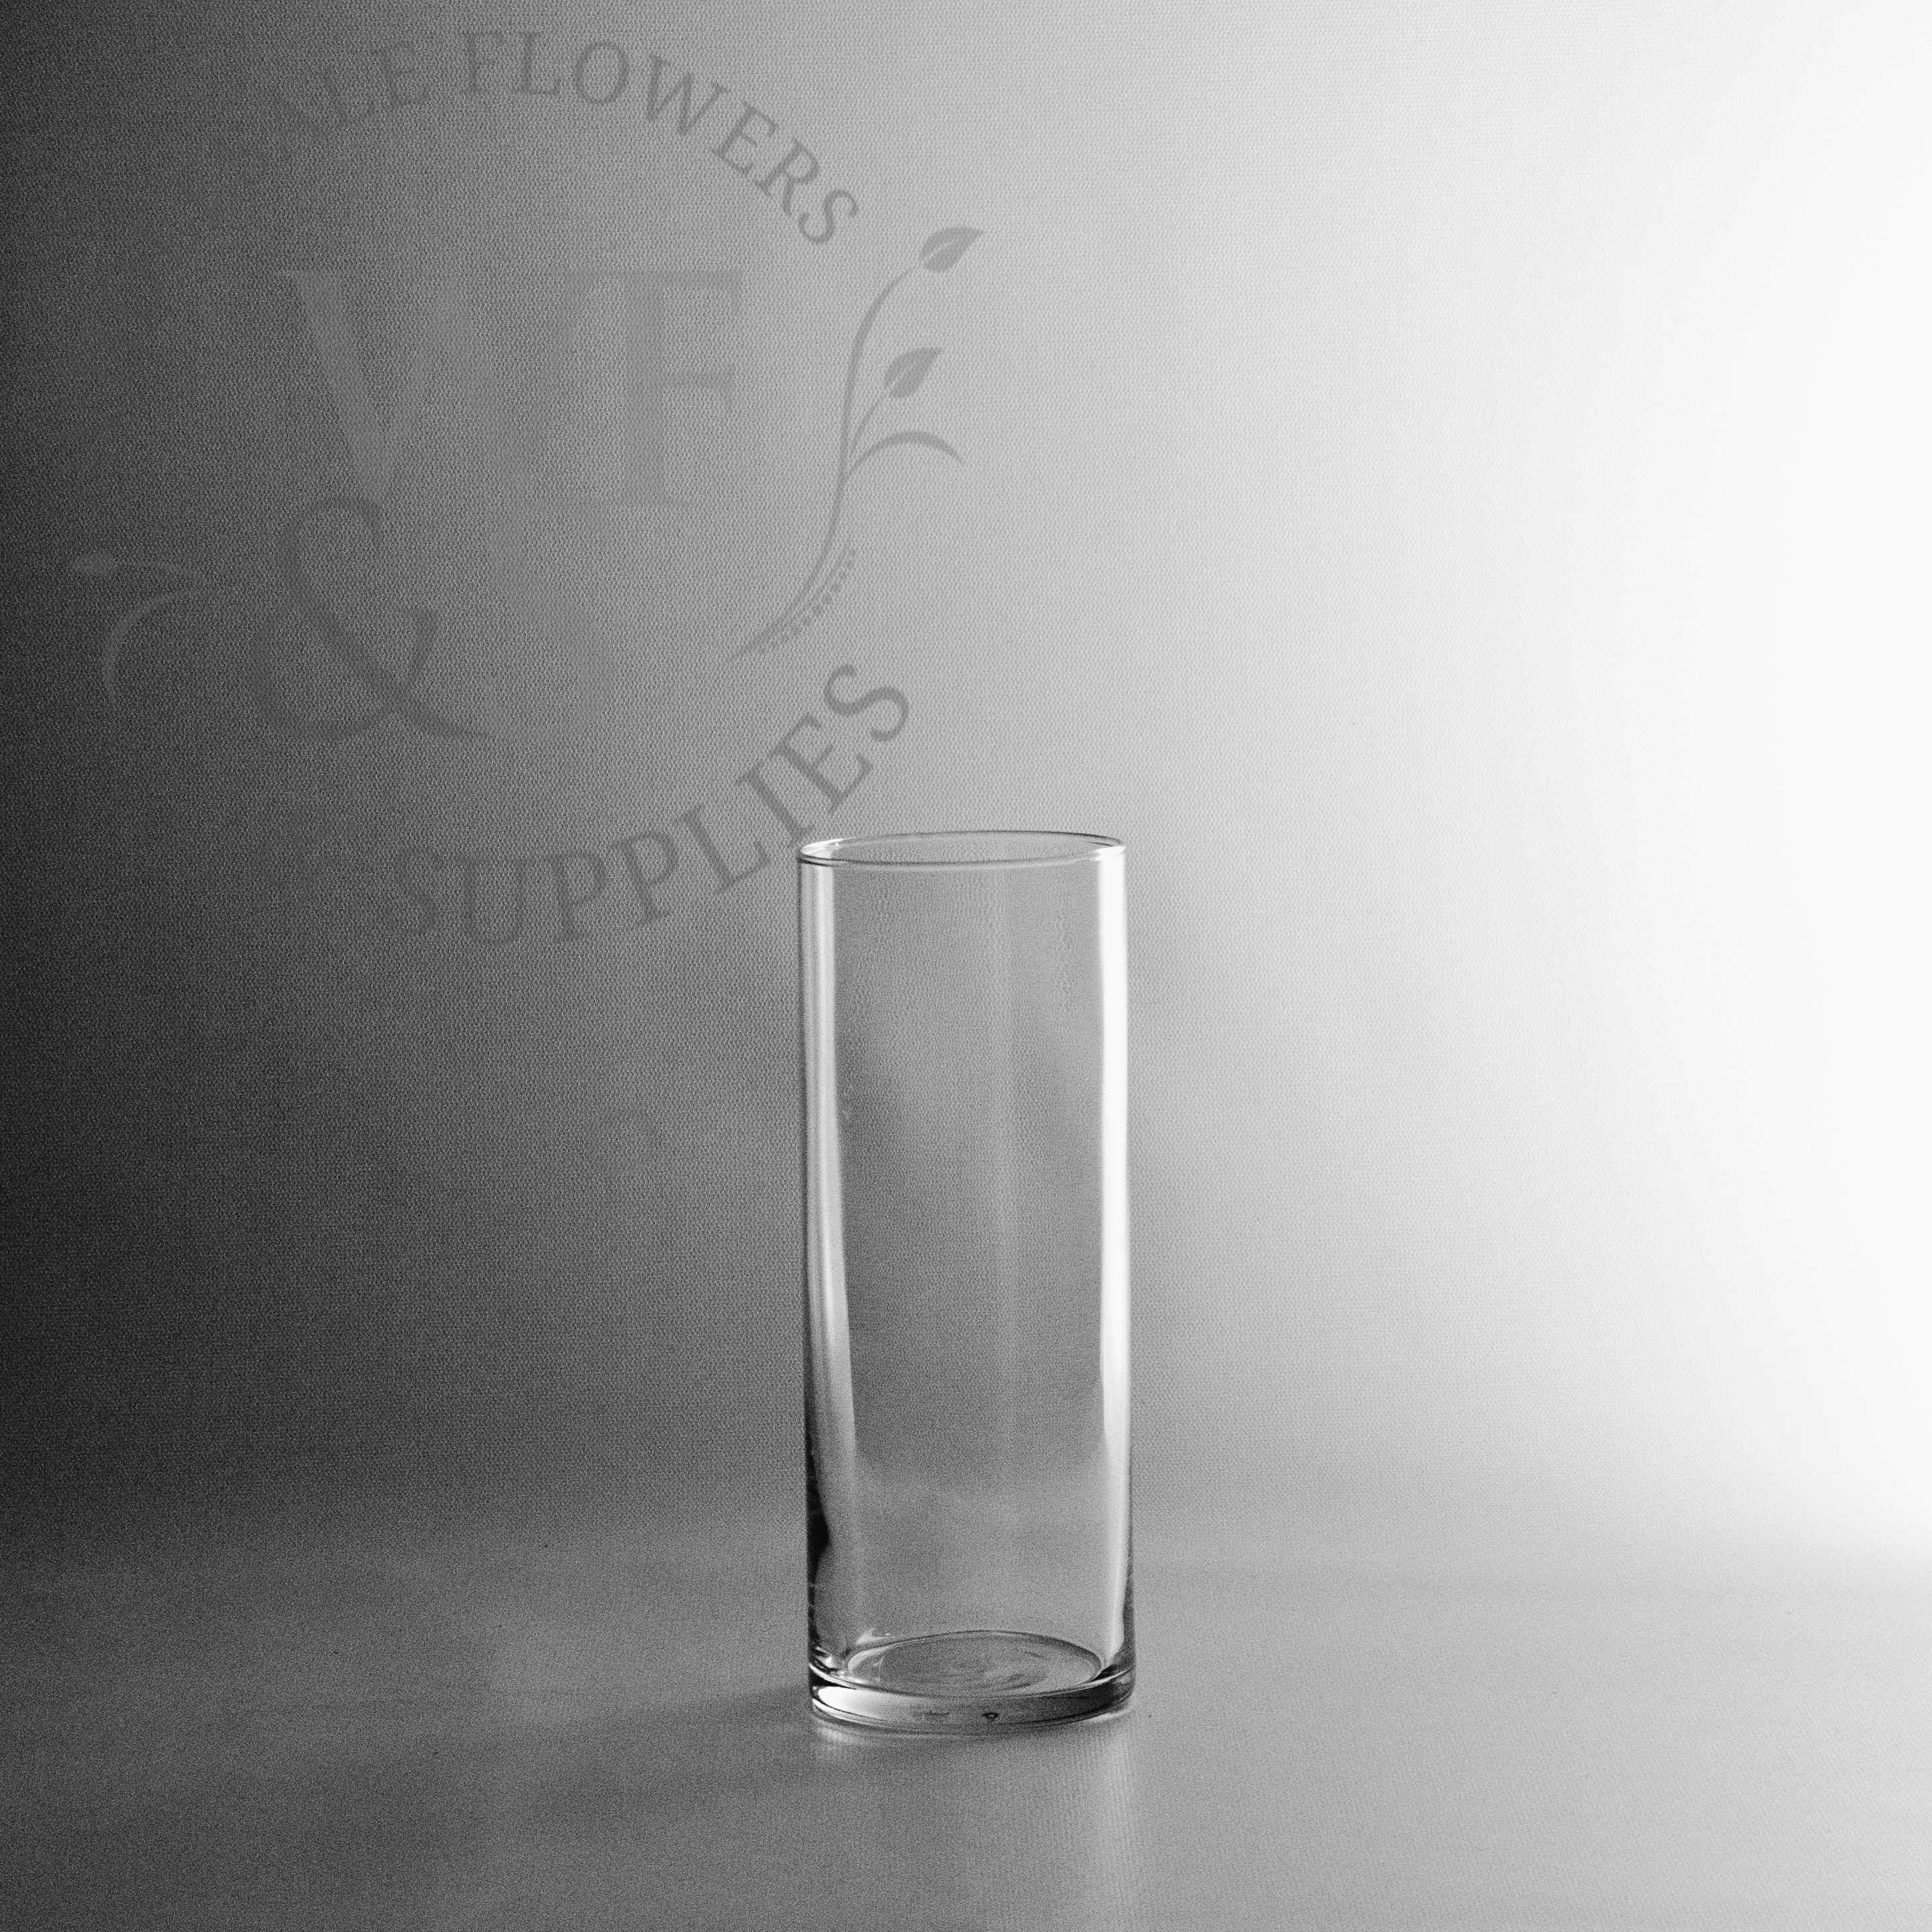 giant hurricane vase of hurricane vases wholesale beautiful flower fantastic hanging glass throughout hurricane vases wholesale beautiful flower fantastic hanging glass globes wholesale rayabernathy